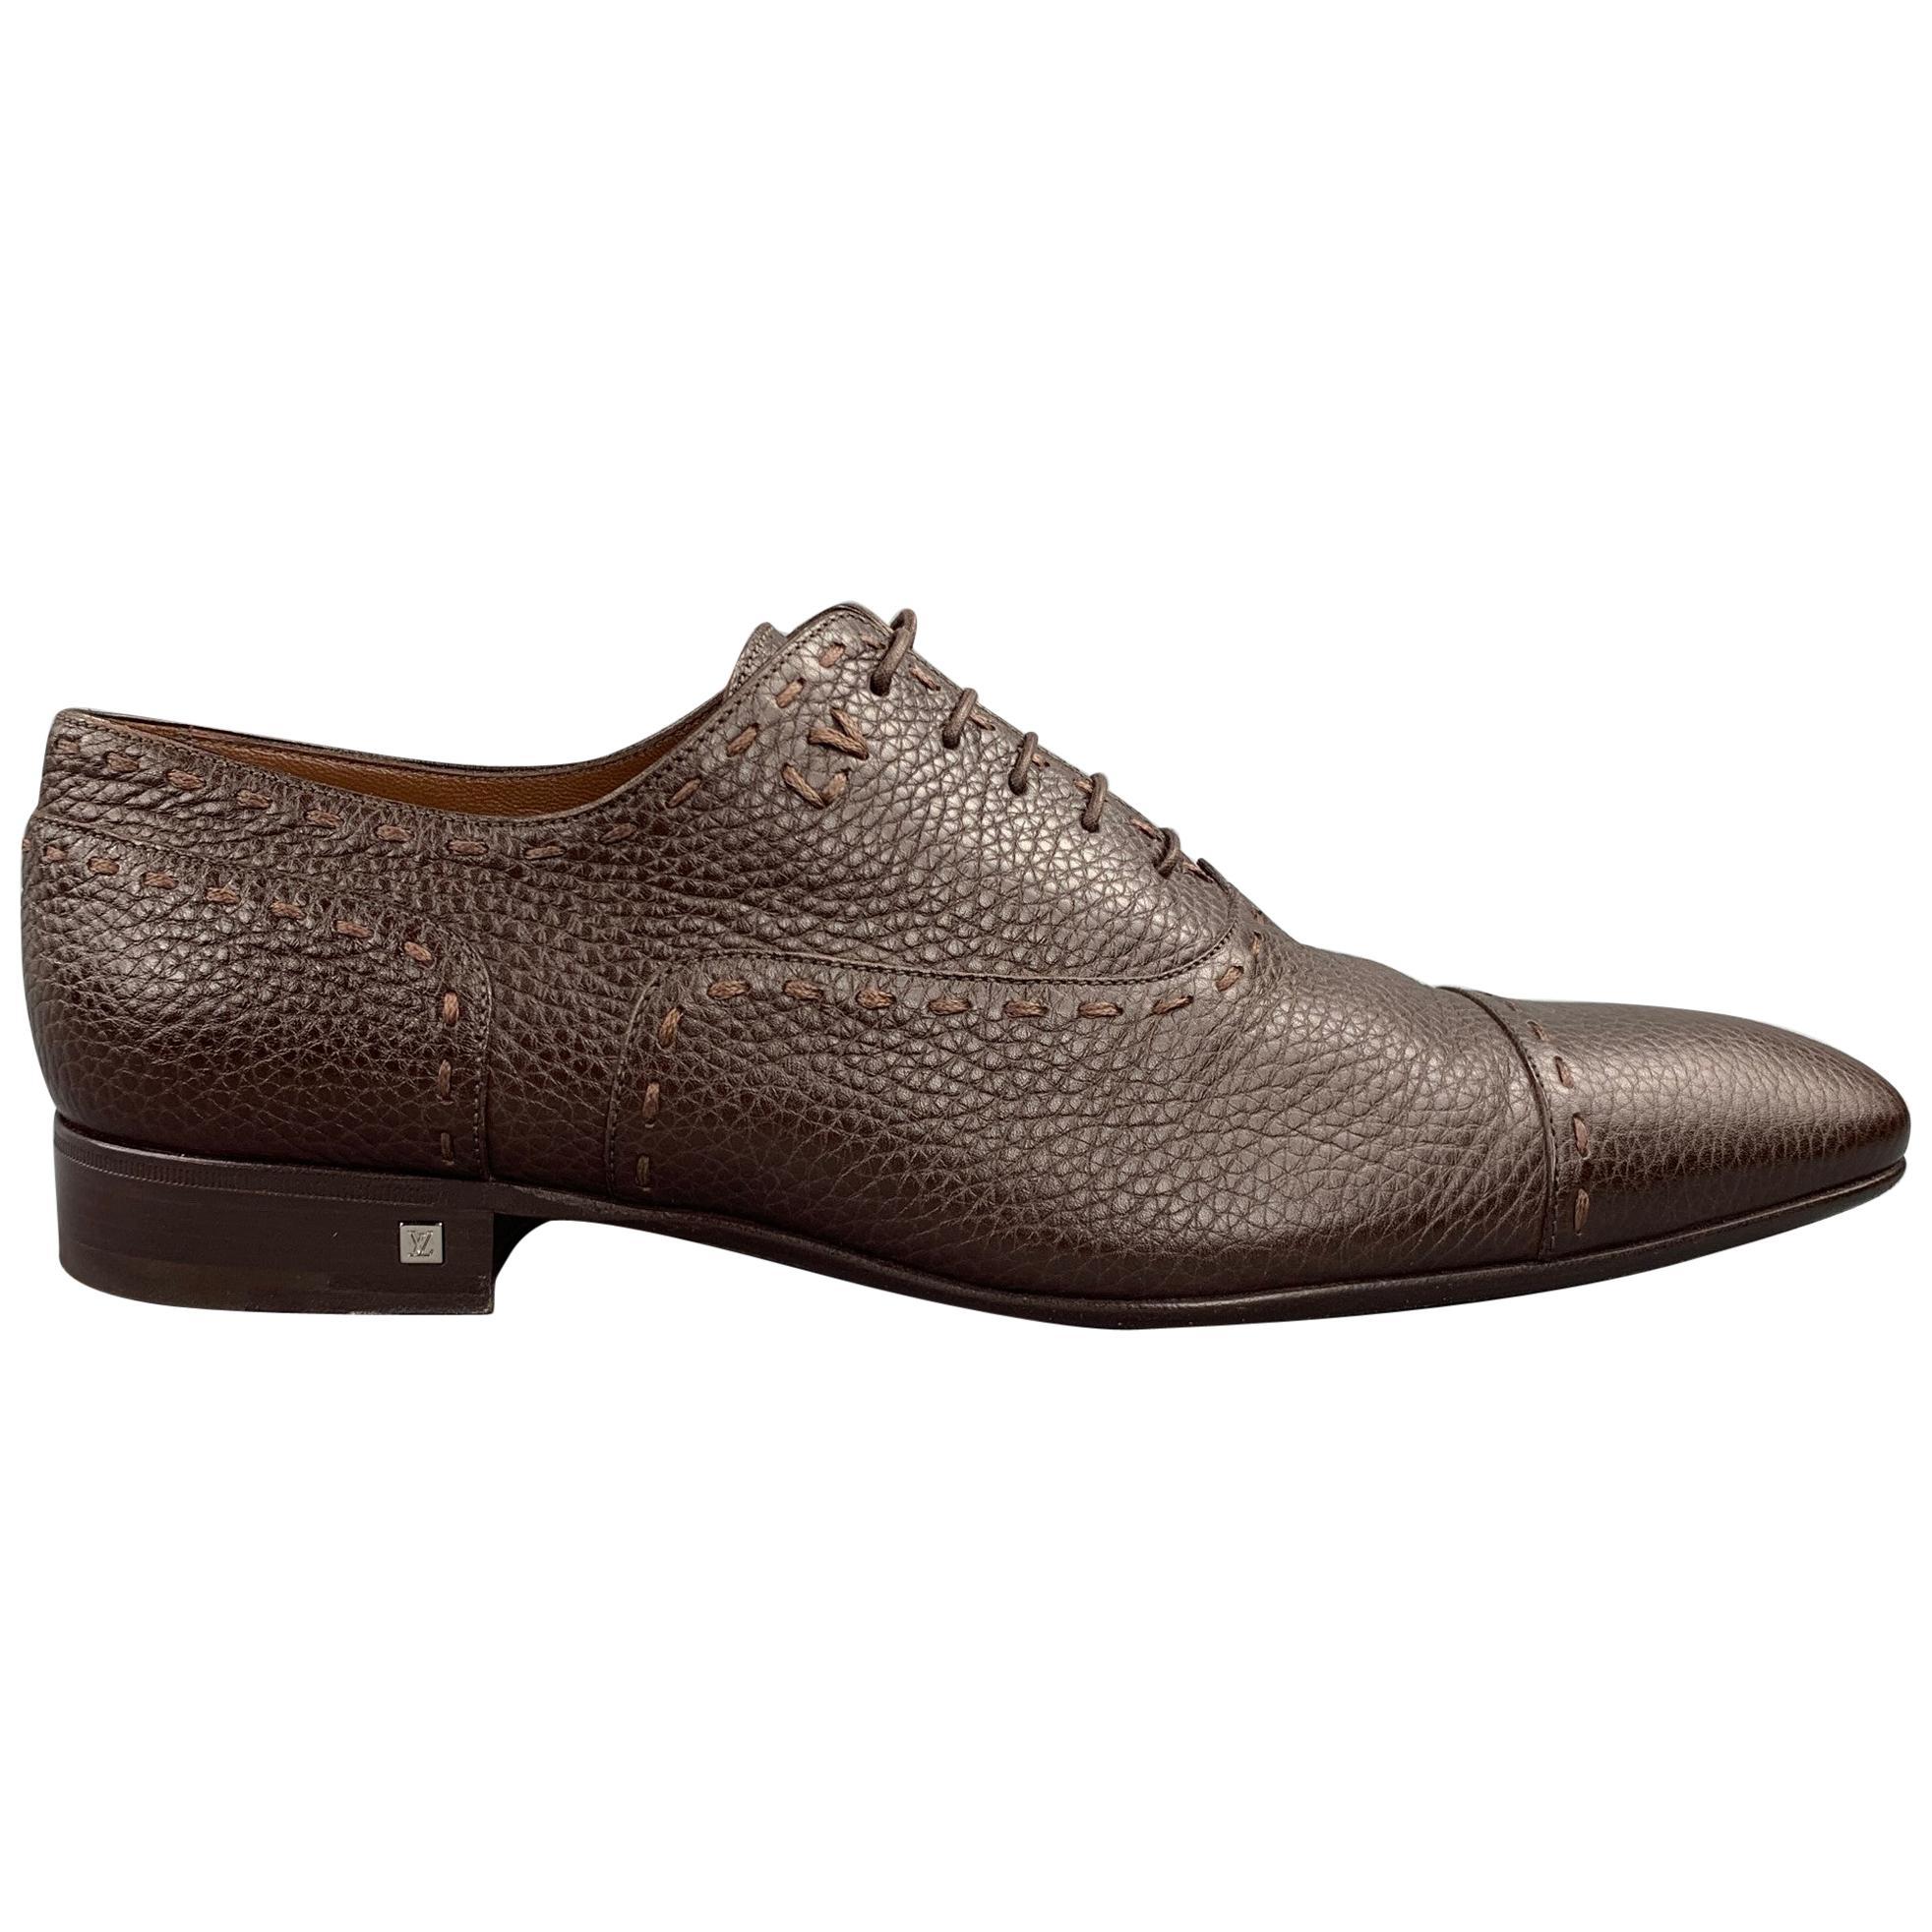 LOUIS VUITTON Size 12 Brown Textured Leather Cap Toe Lace Up Shoes